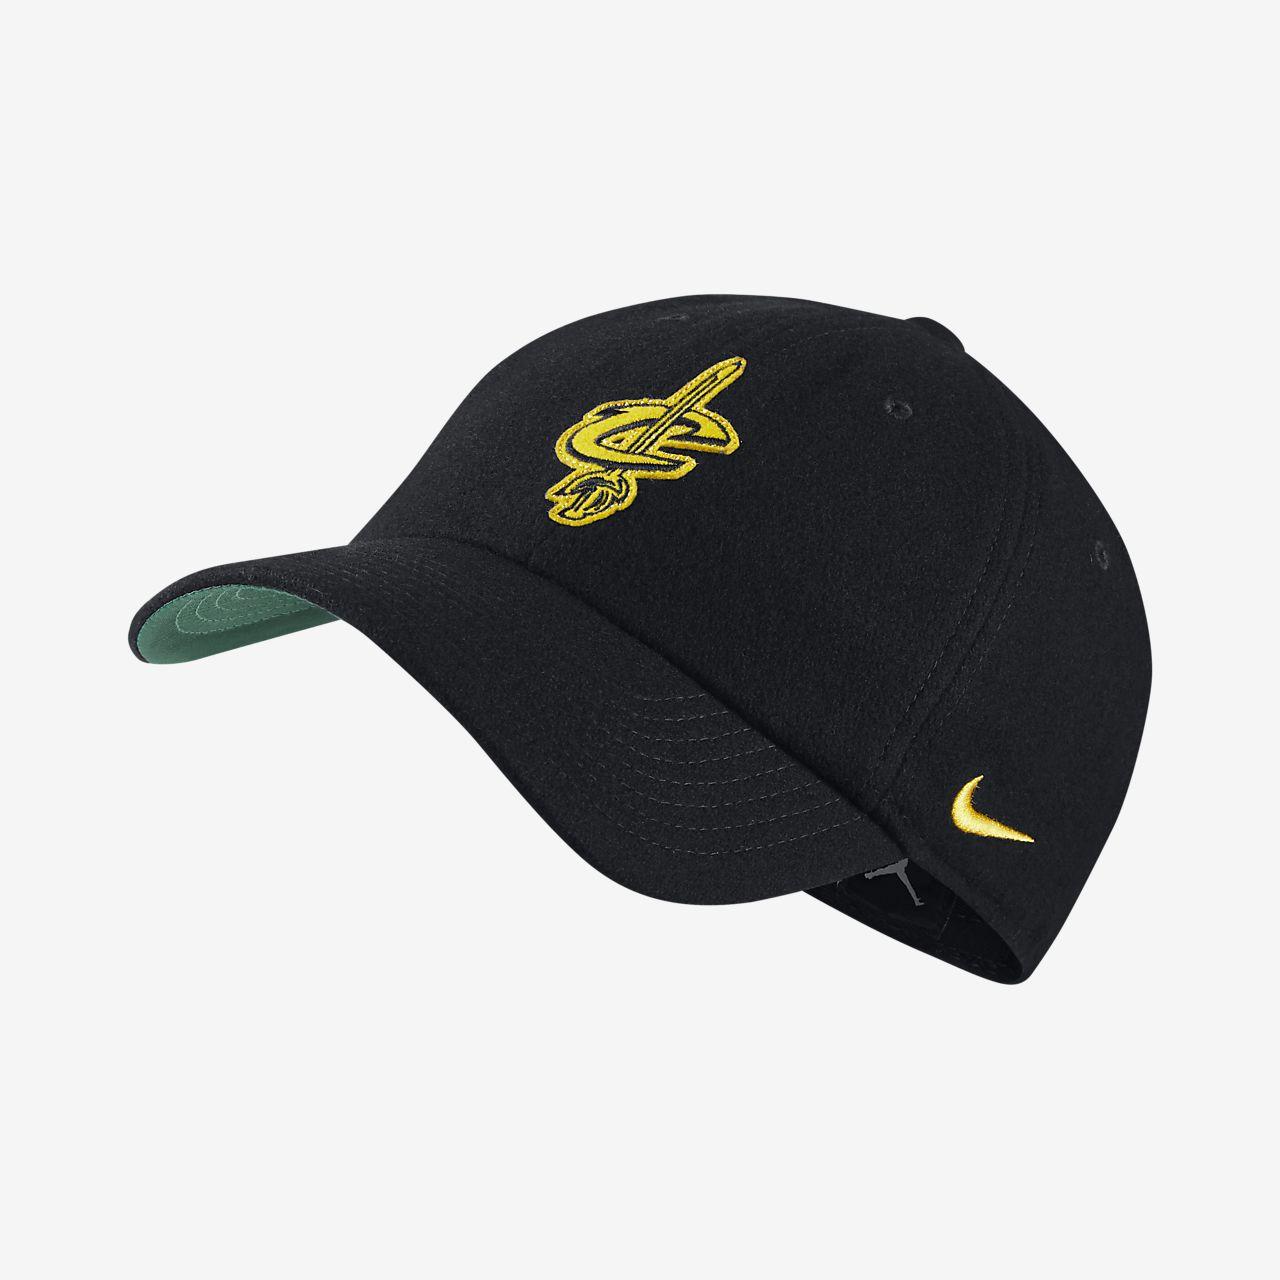 cleveland cavaliers nike heritage86 unisex nba hat nike com rh nike com LeBron Graffiti Hat Hat to Match LeBron 11